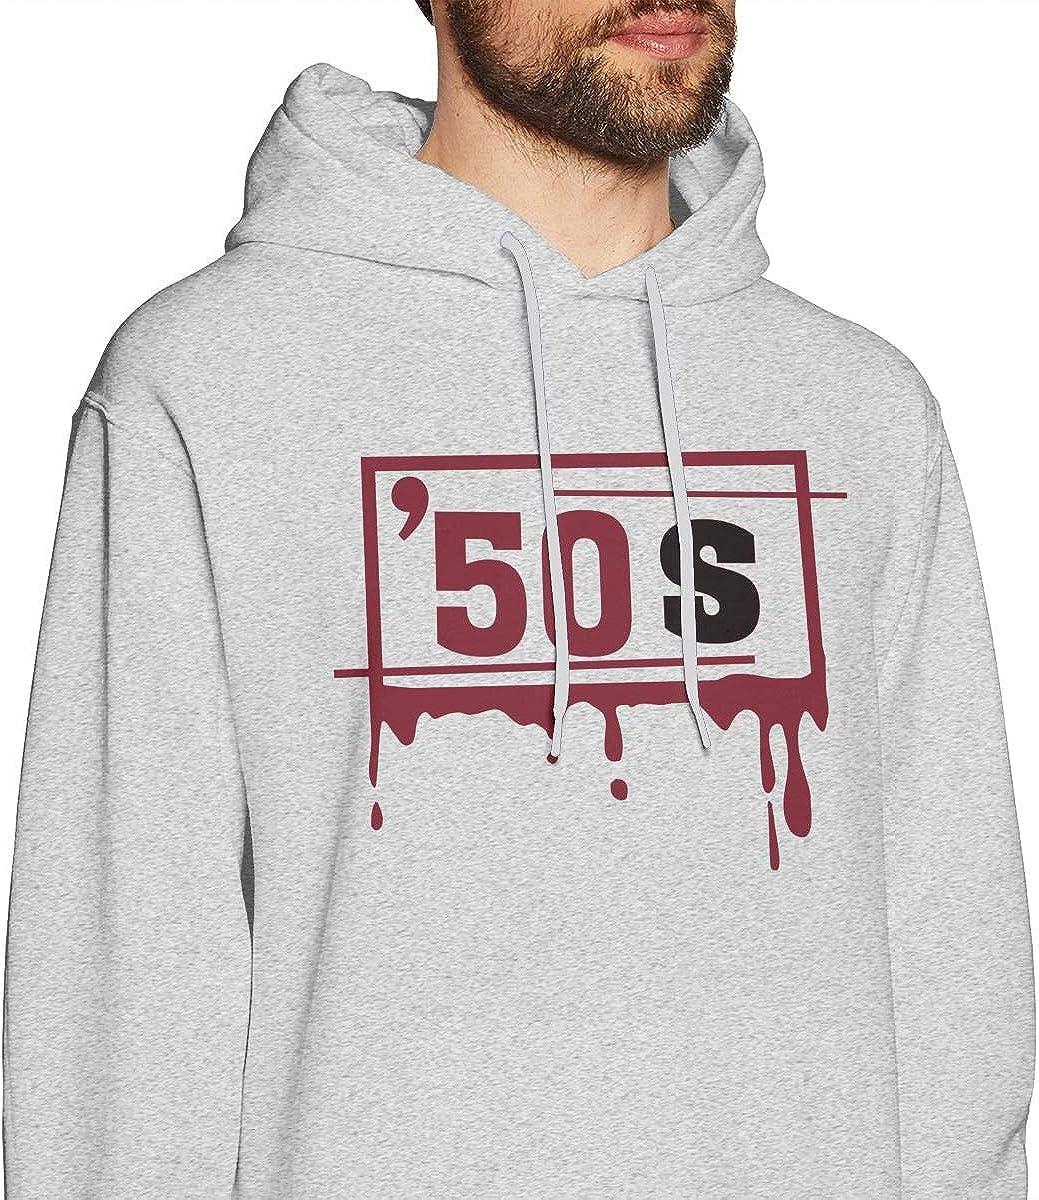 Mens Hooded Sweatshirt European Version of The Loose Hooded Fashion Tide Clothing 50s Logo Gray